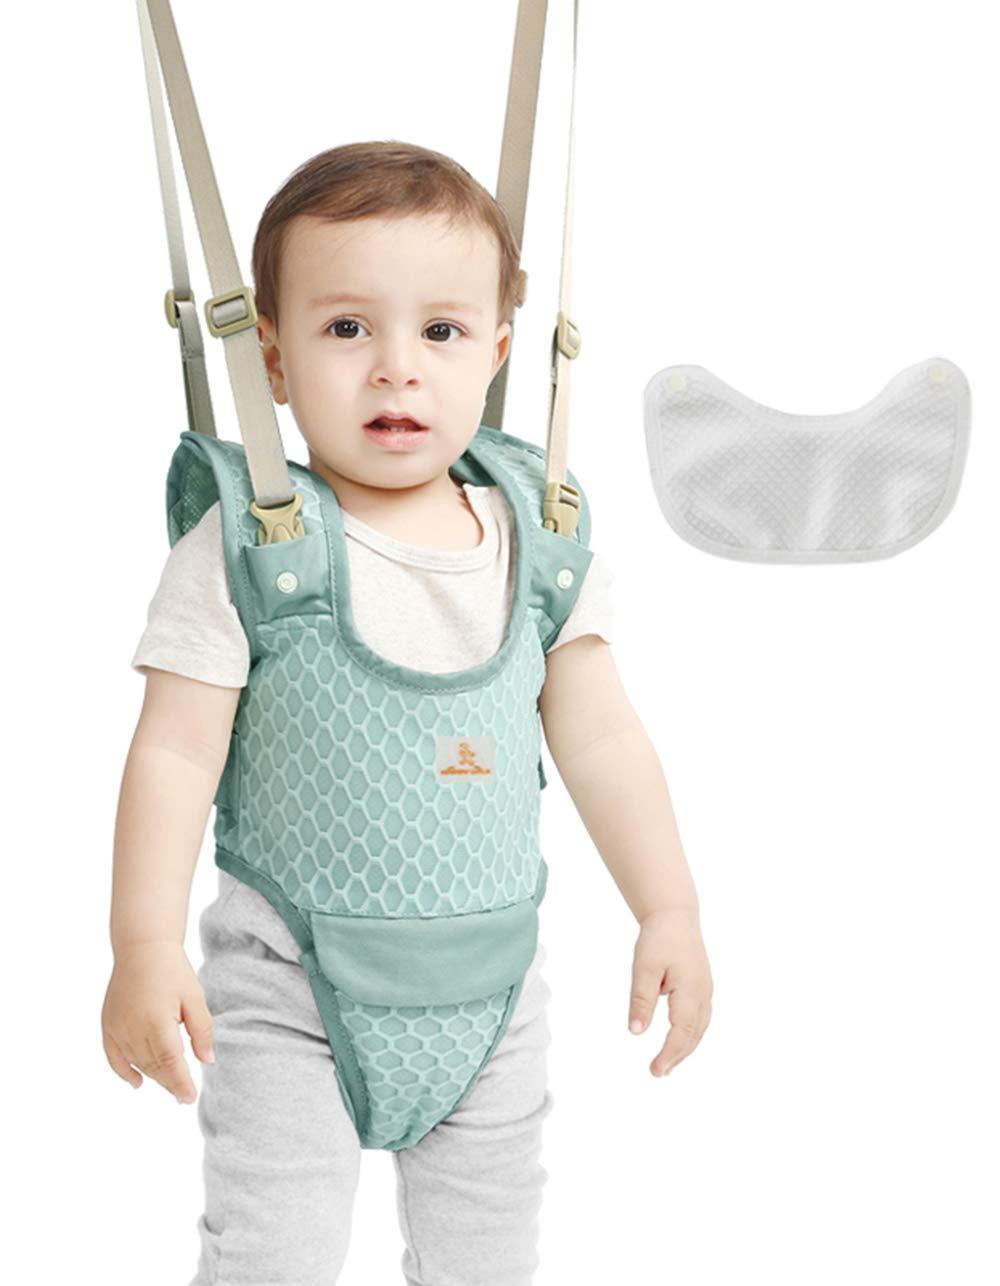 Bibs Set Blue Baby Detachable Walking Harness Adjustable Walk Learning Protective Belt